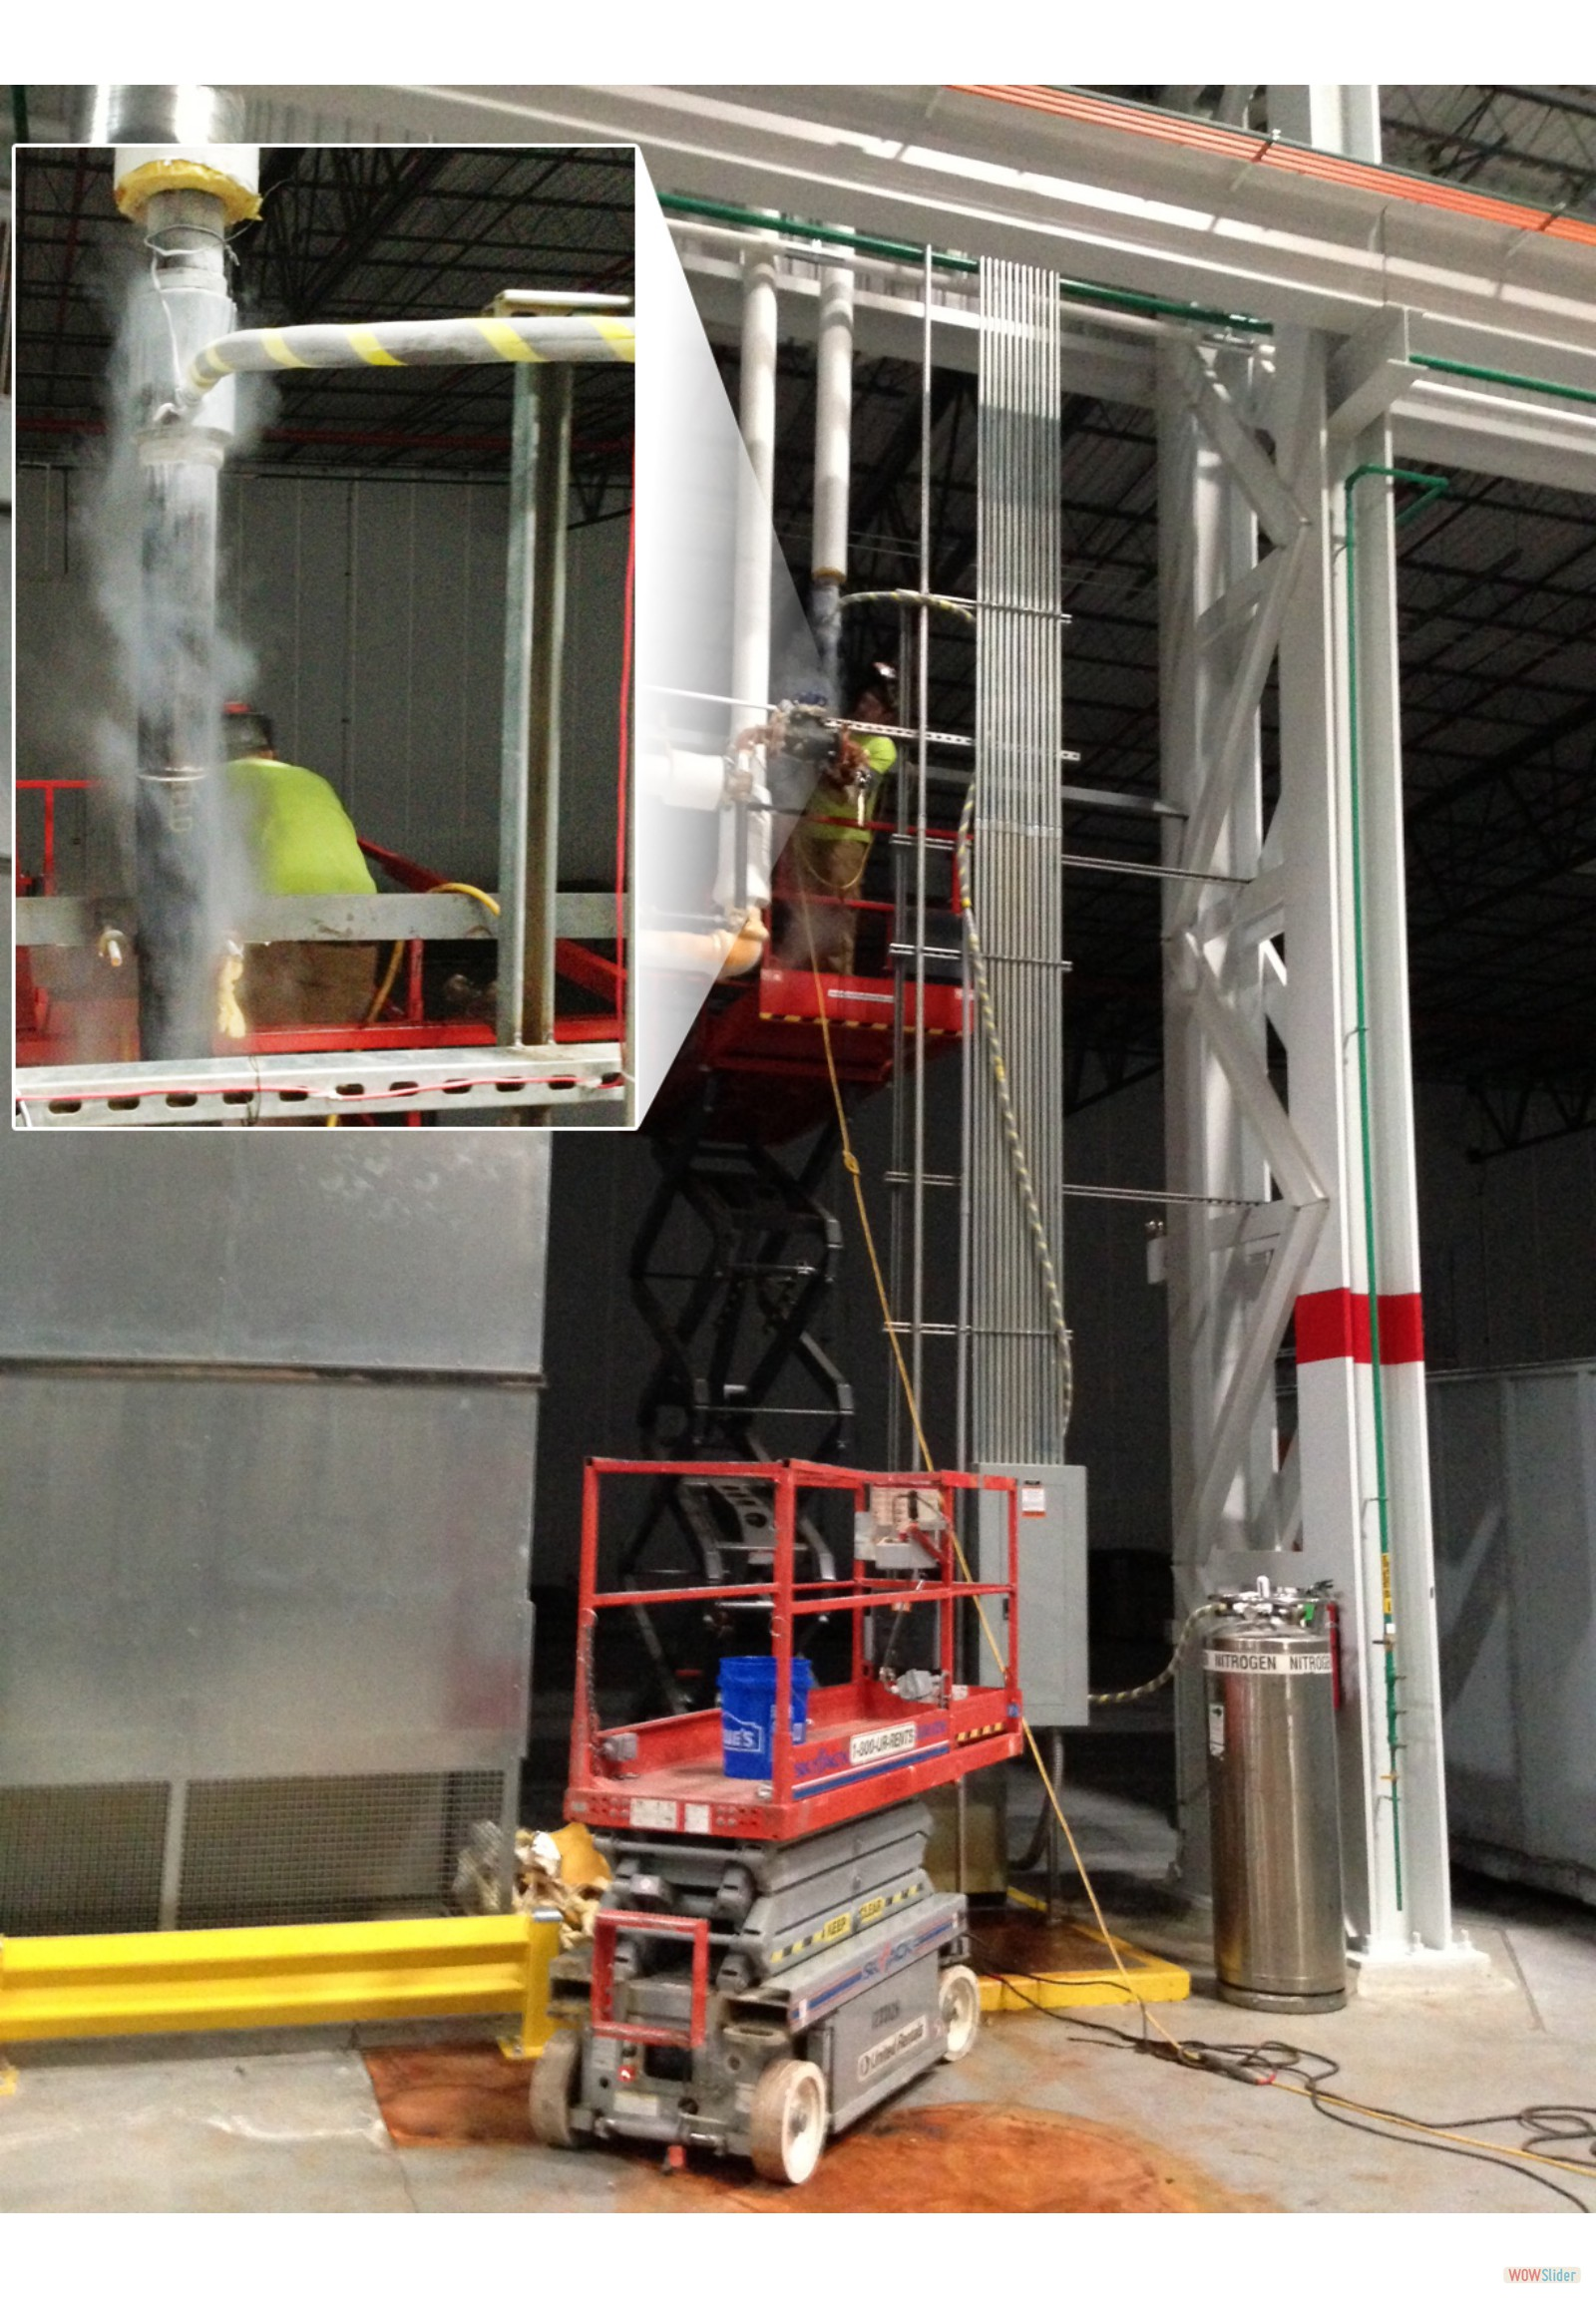 3 Inch Pipeline System Leak Repair March 2014